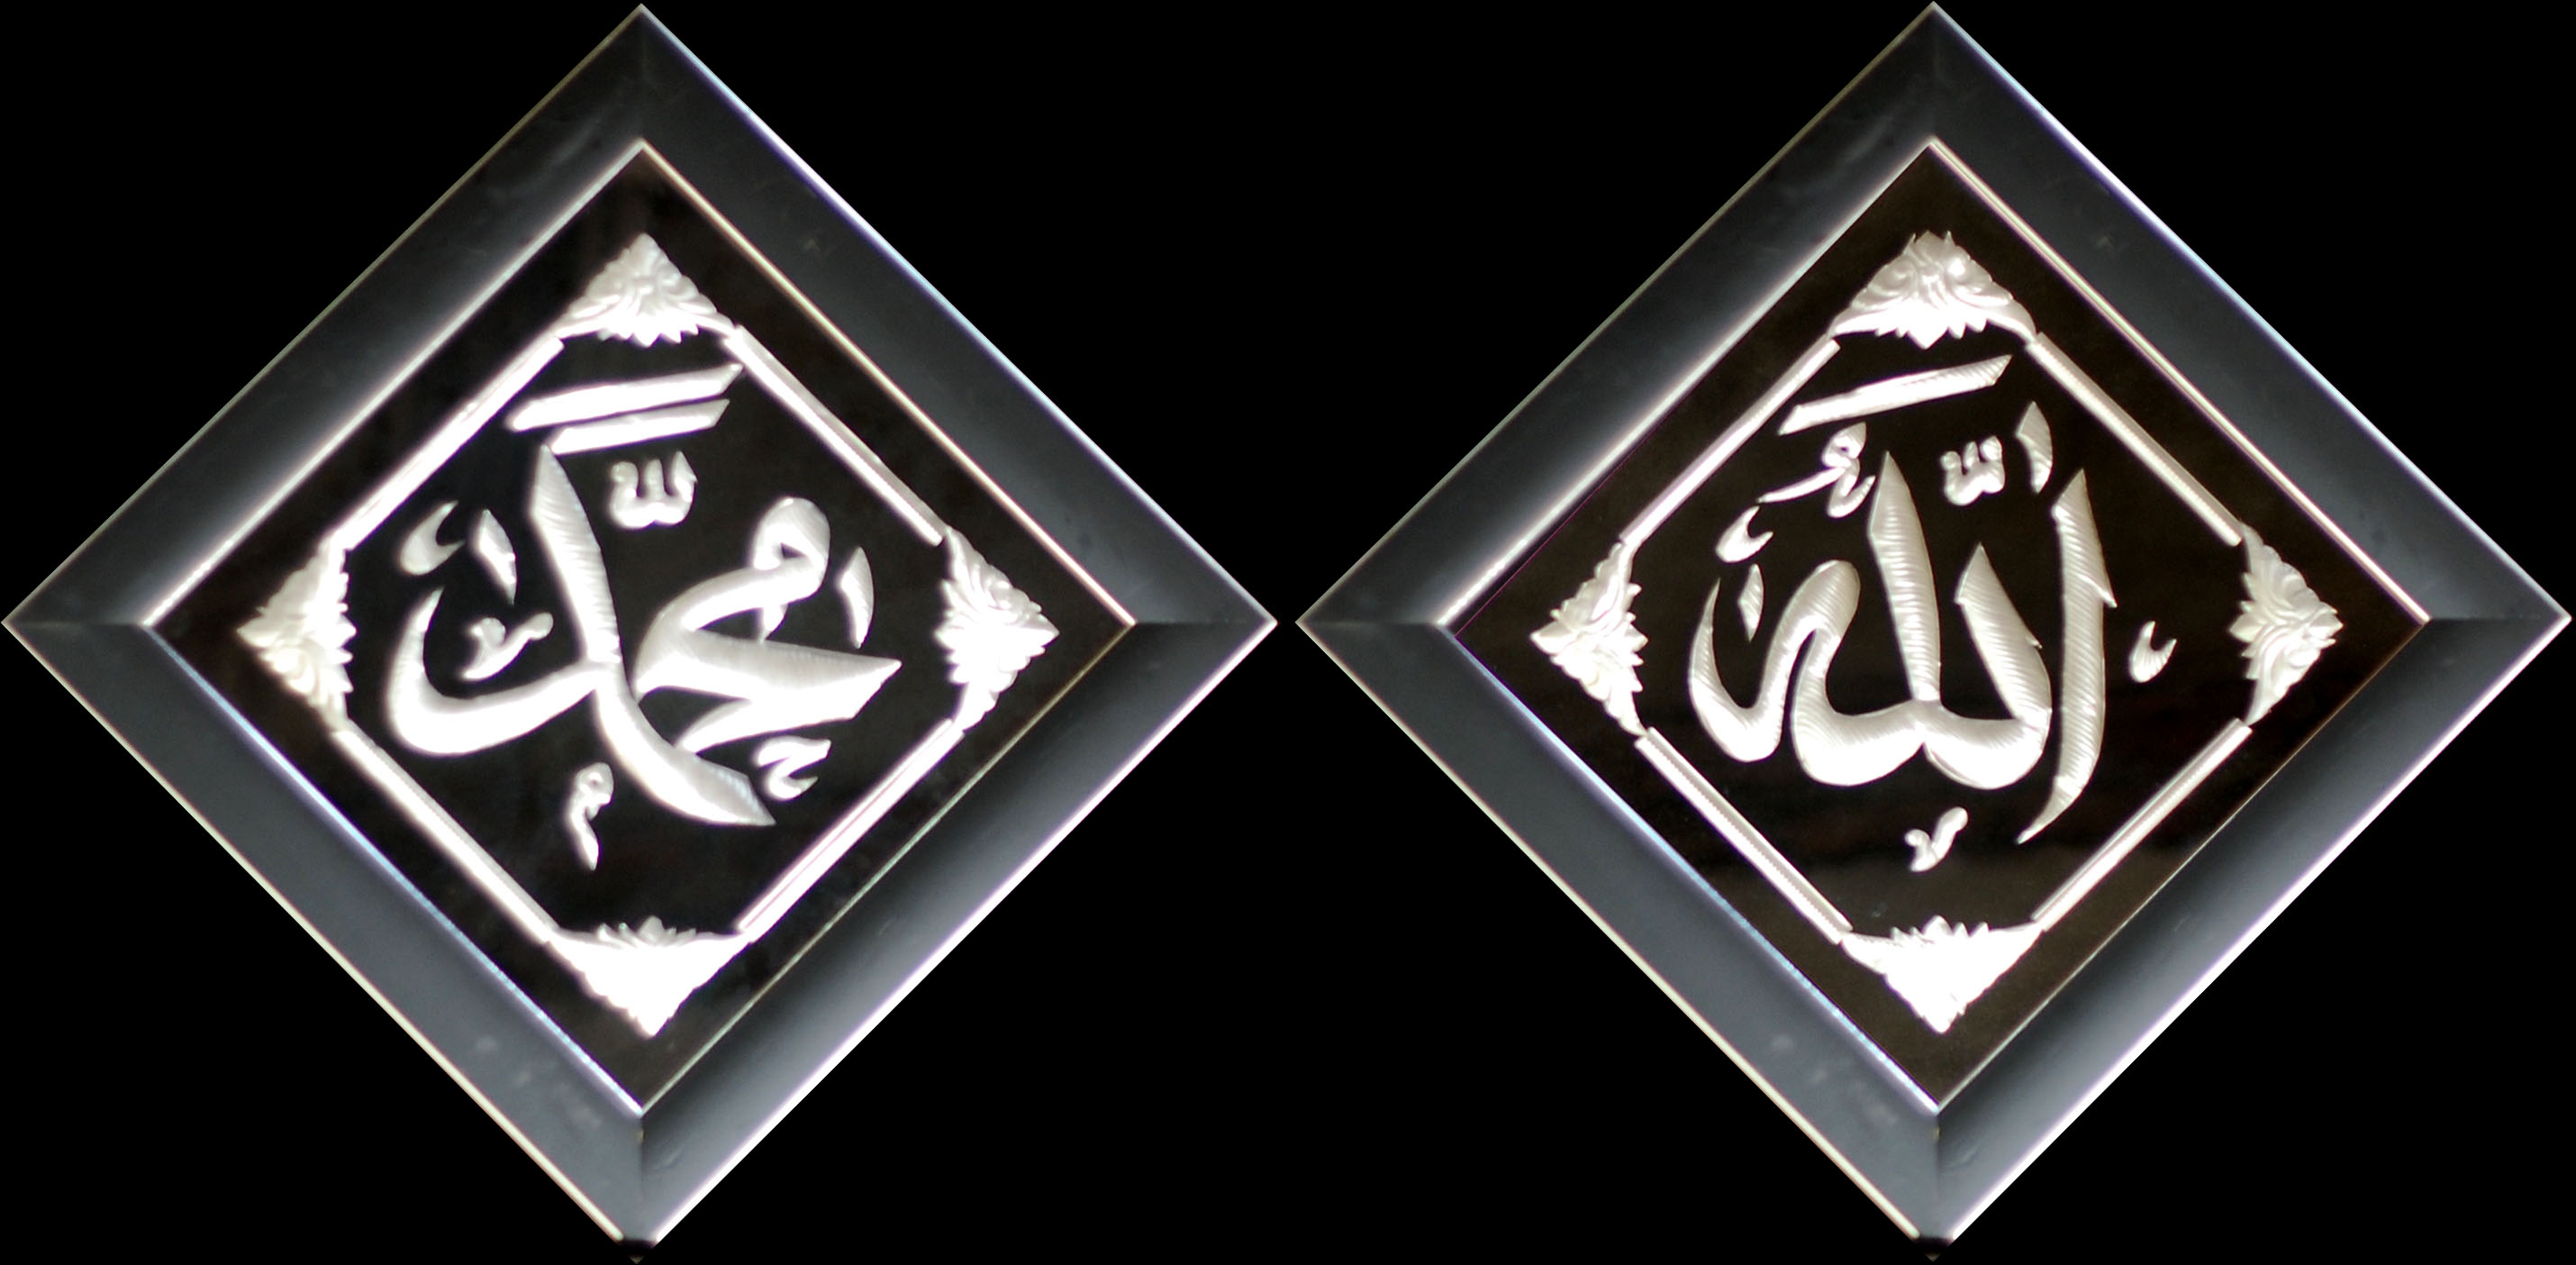 87+ Gambar Allah Muhammad Kaligrafi Paling Bagus